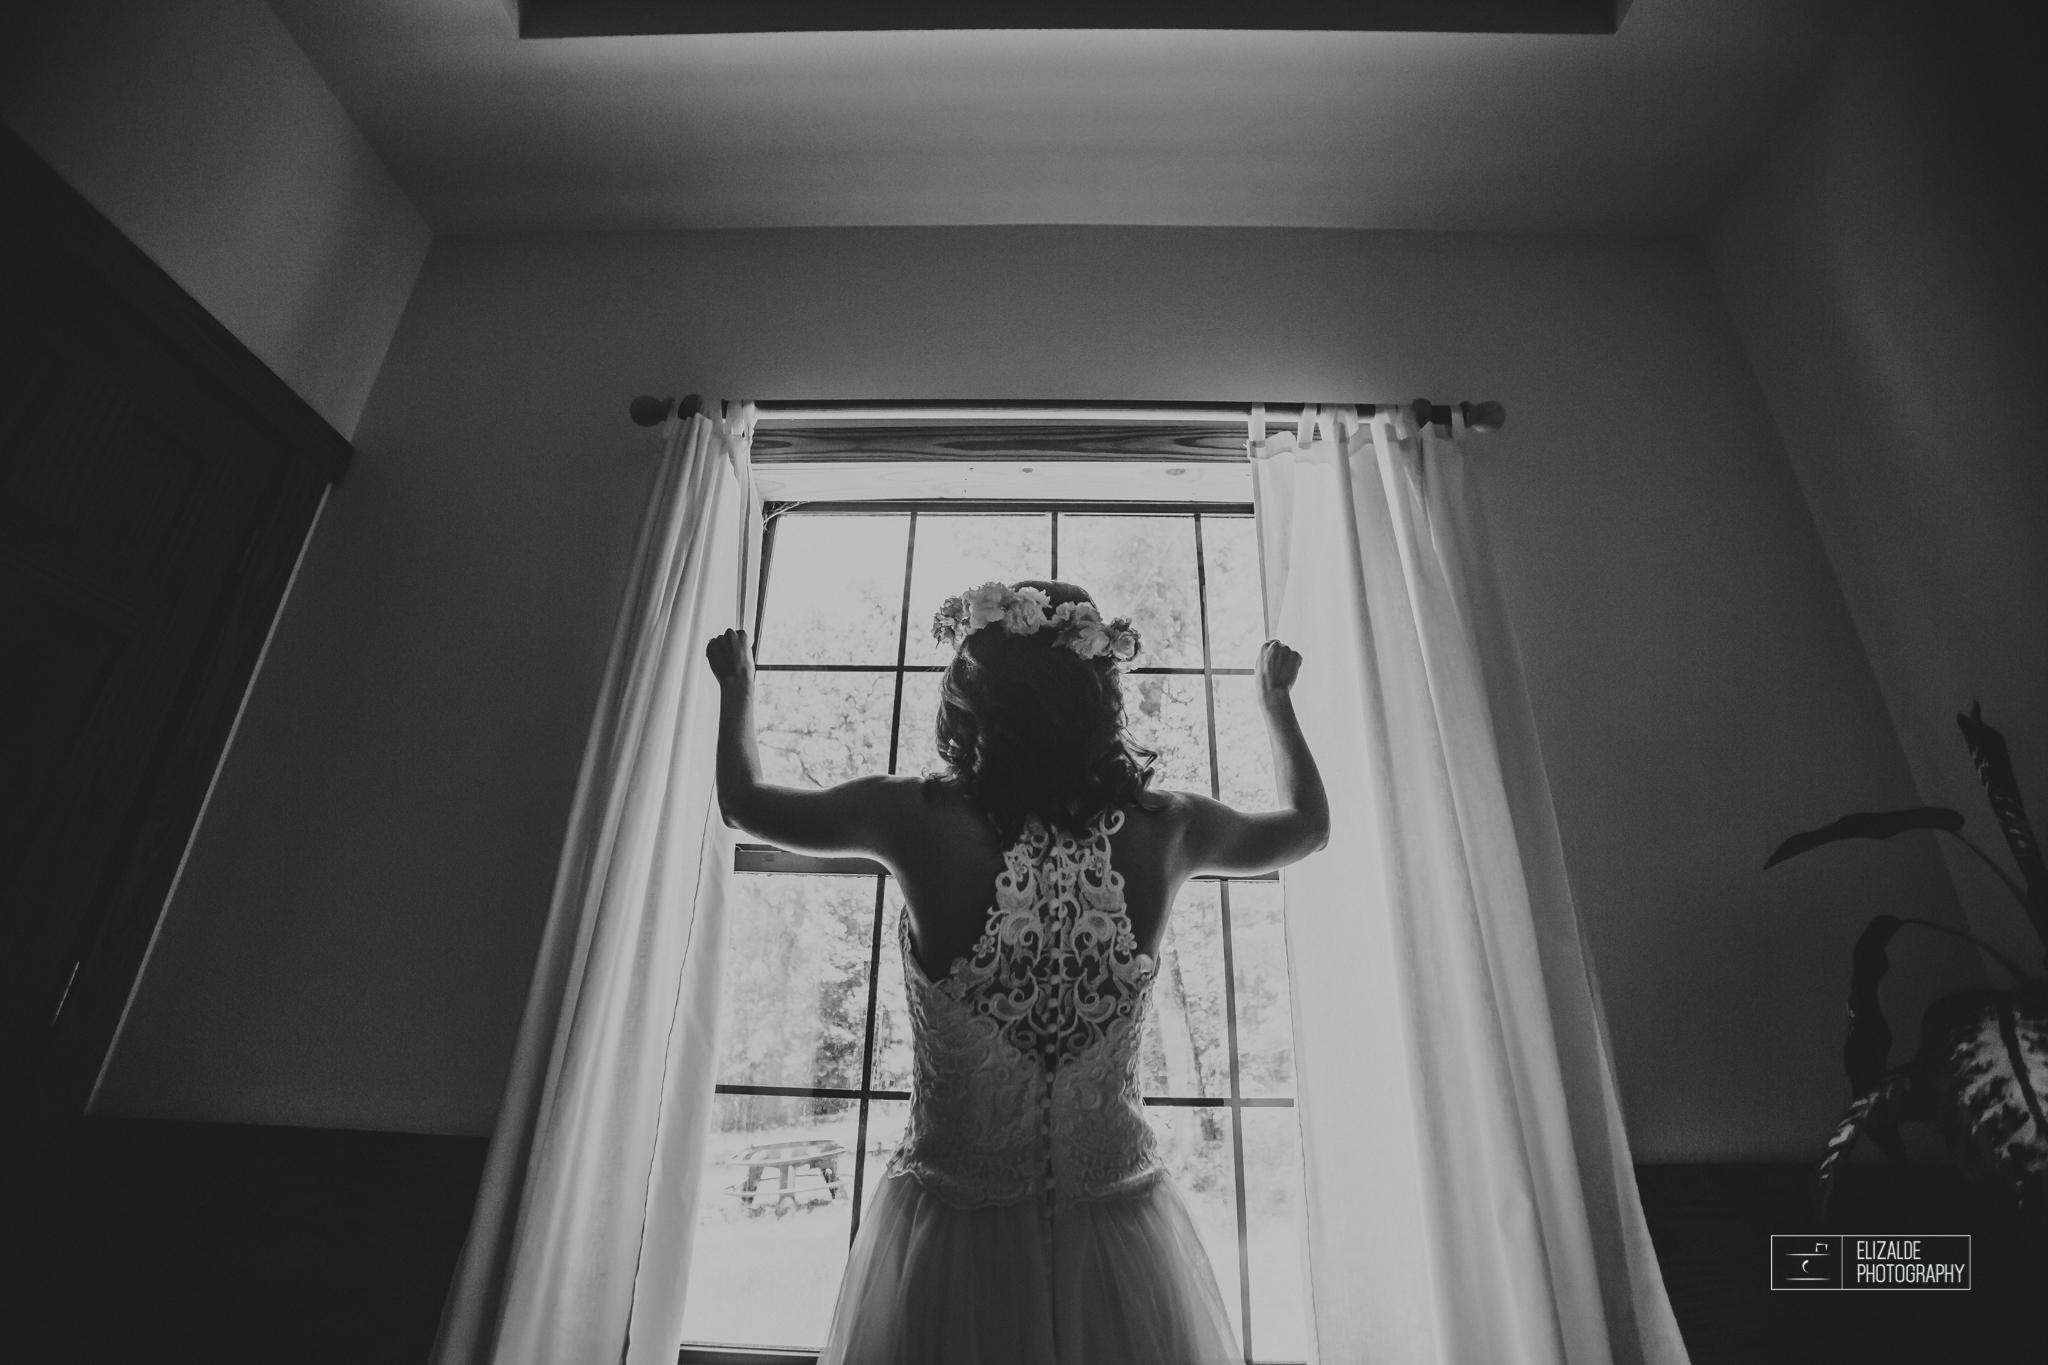 Wedding photographer Dallas_Elizalde Photography_DFW Wedding photographer_ Hickoty Hills_Wedding Photography (21 of 90).jpg